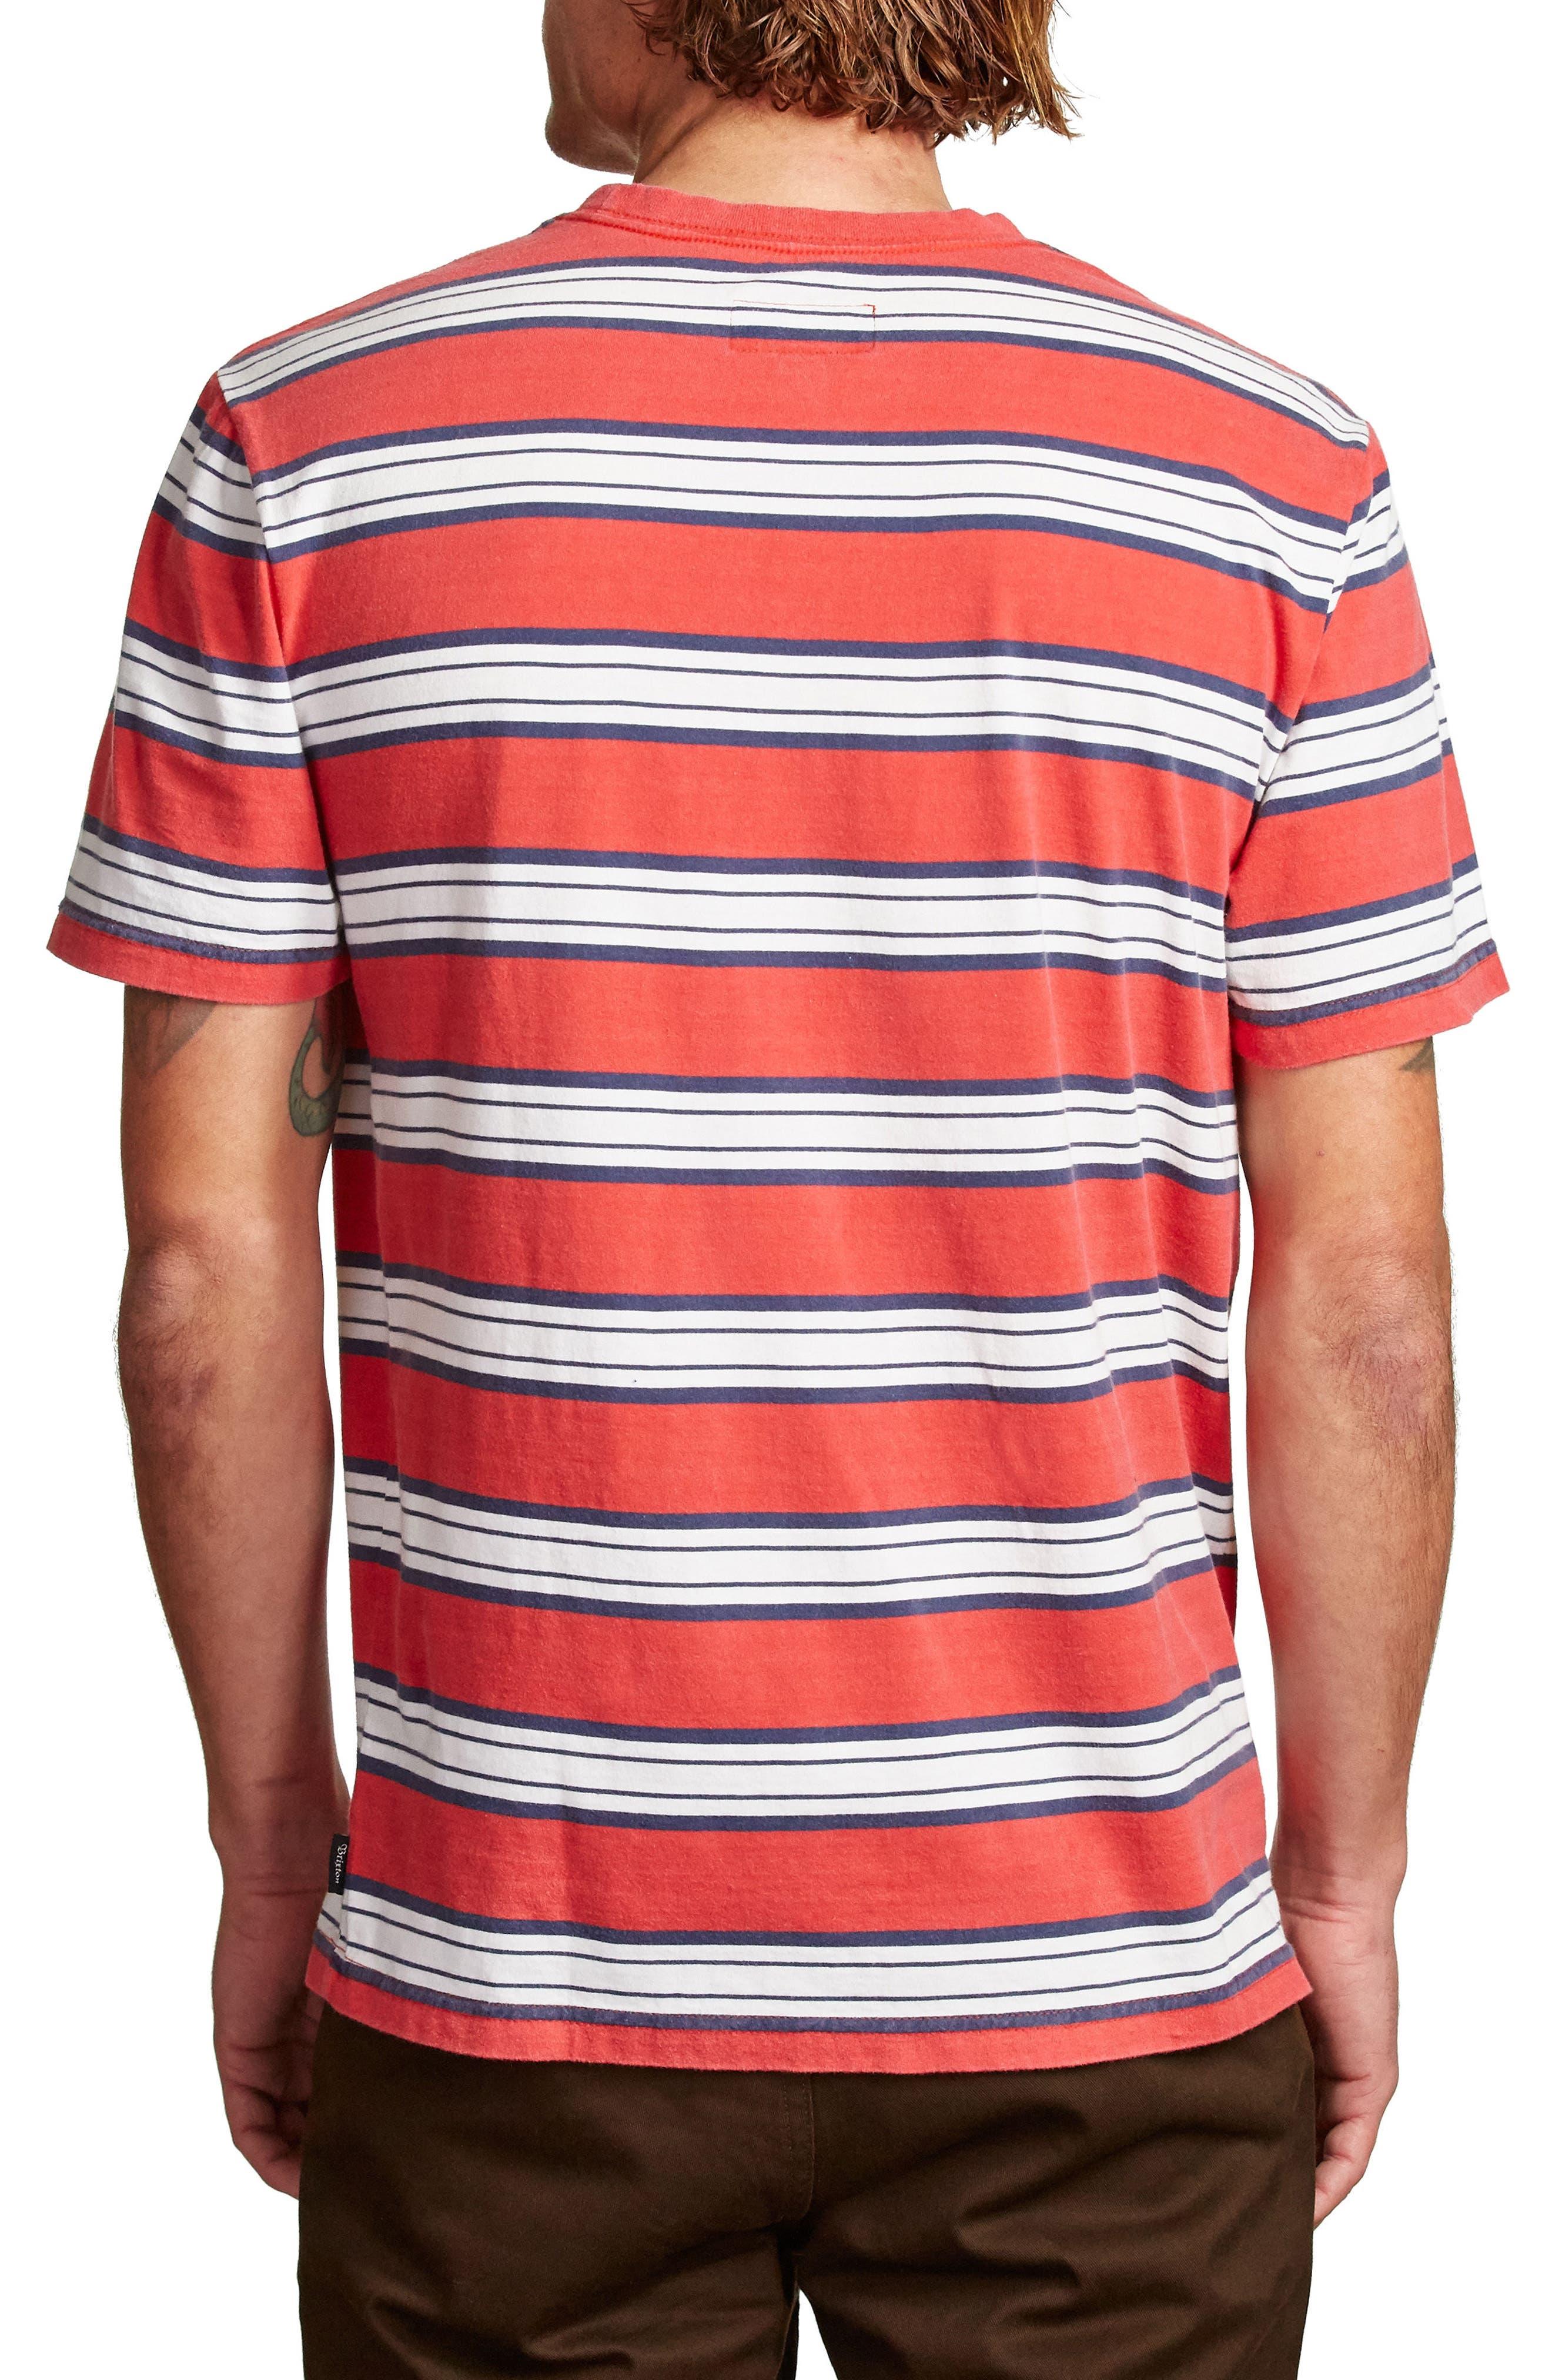 Hilt T-Shirt,                             Alternate thumbnail 2, color,                             Red